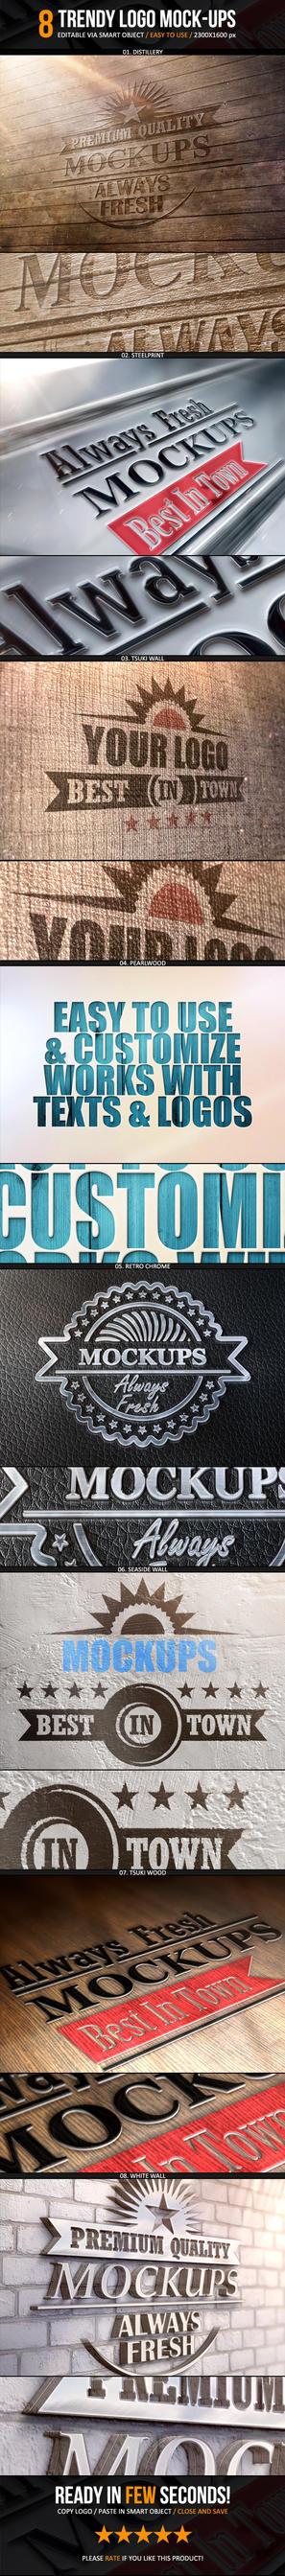 Trendy Logo Mockups - 8 Smart Templates by NuwanP